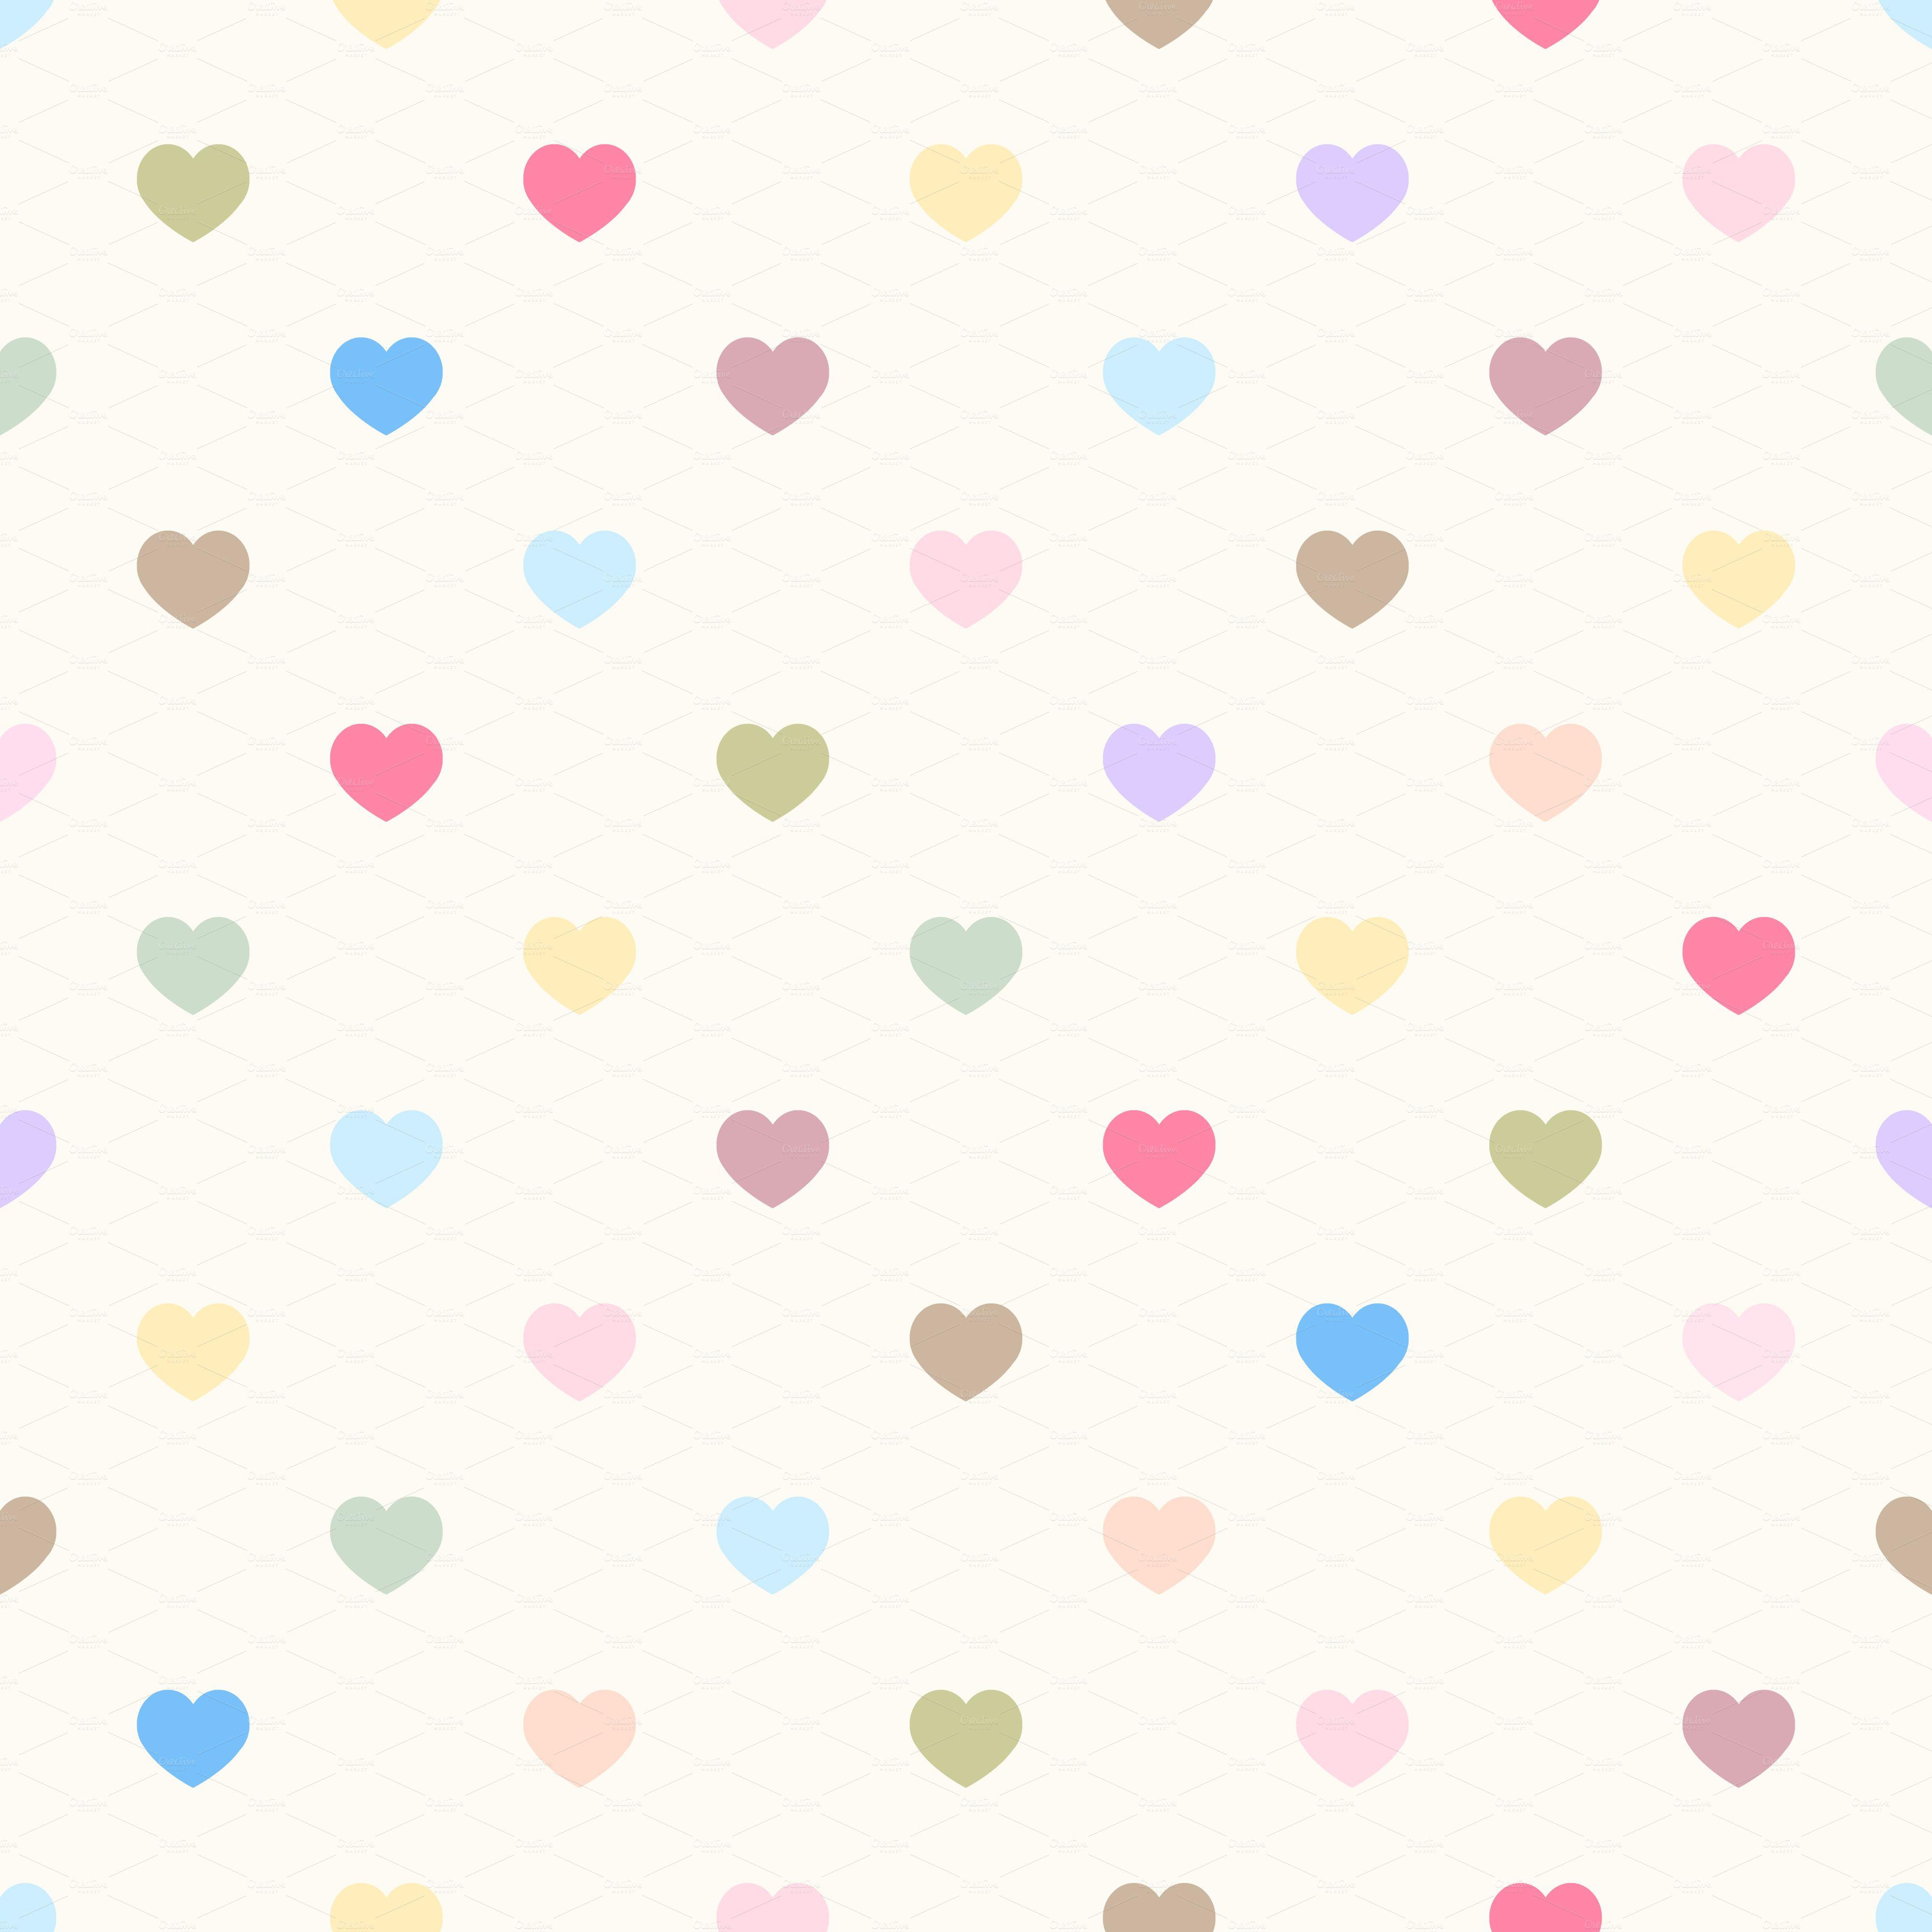 Cute Heart Tumblr Background Tumblr Backgrounds Heart Pattern Background Tumblr Pattern